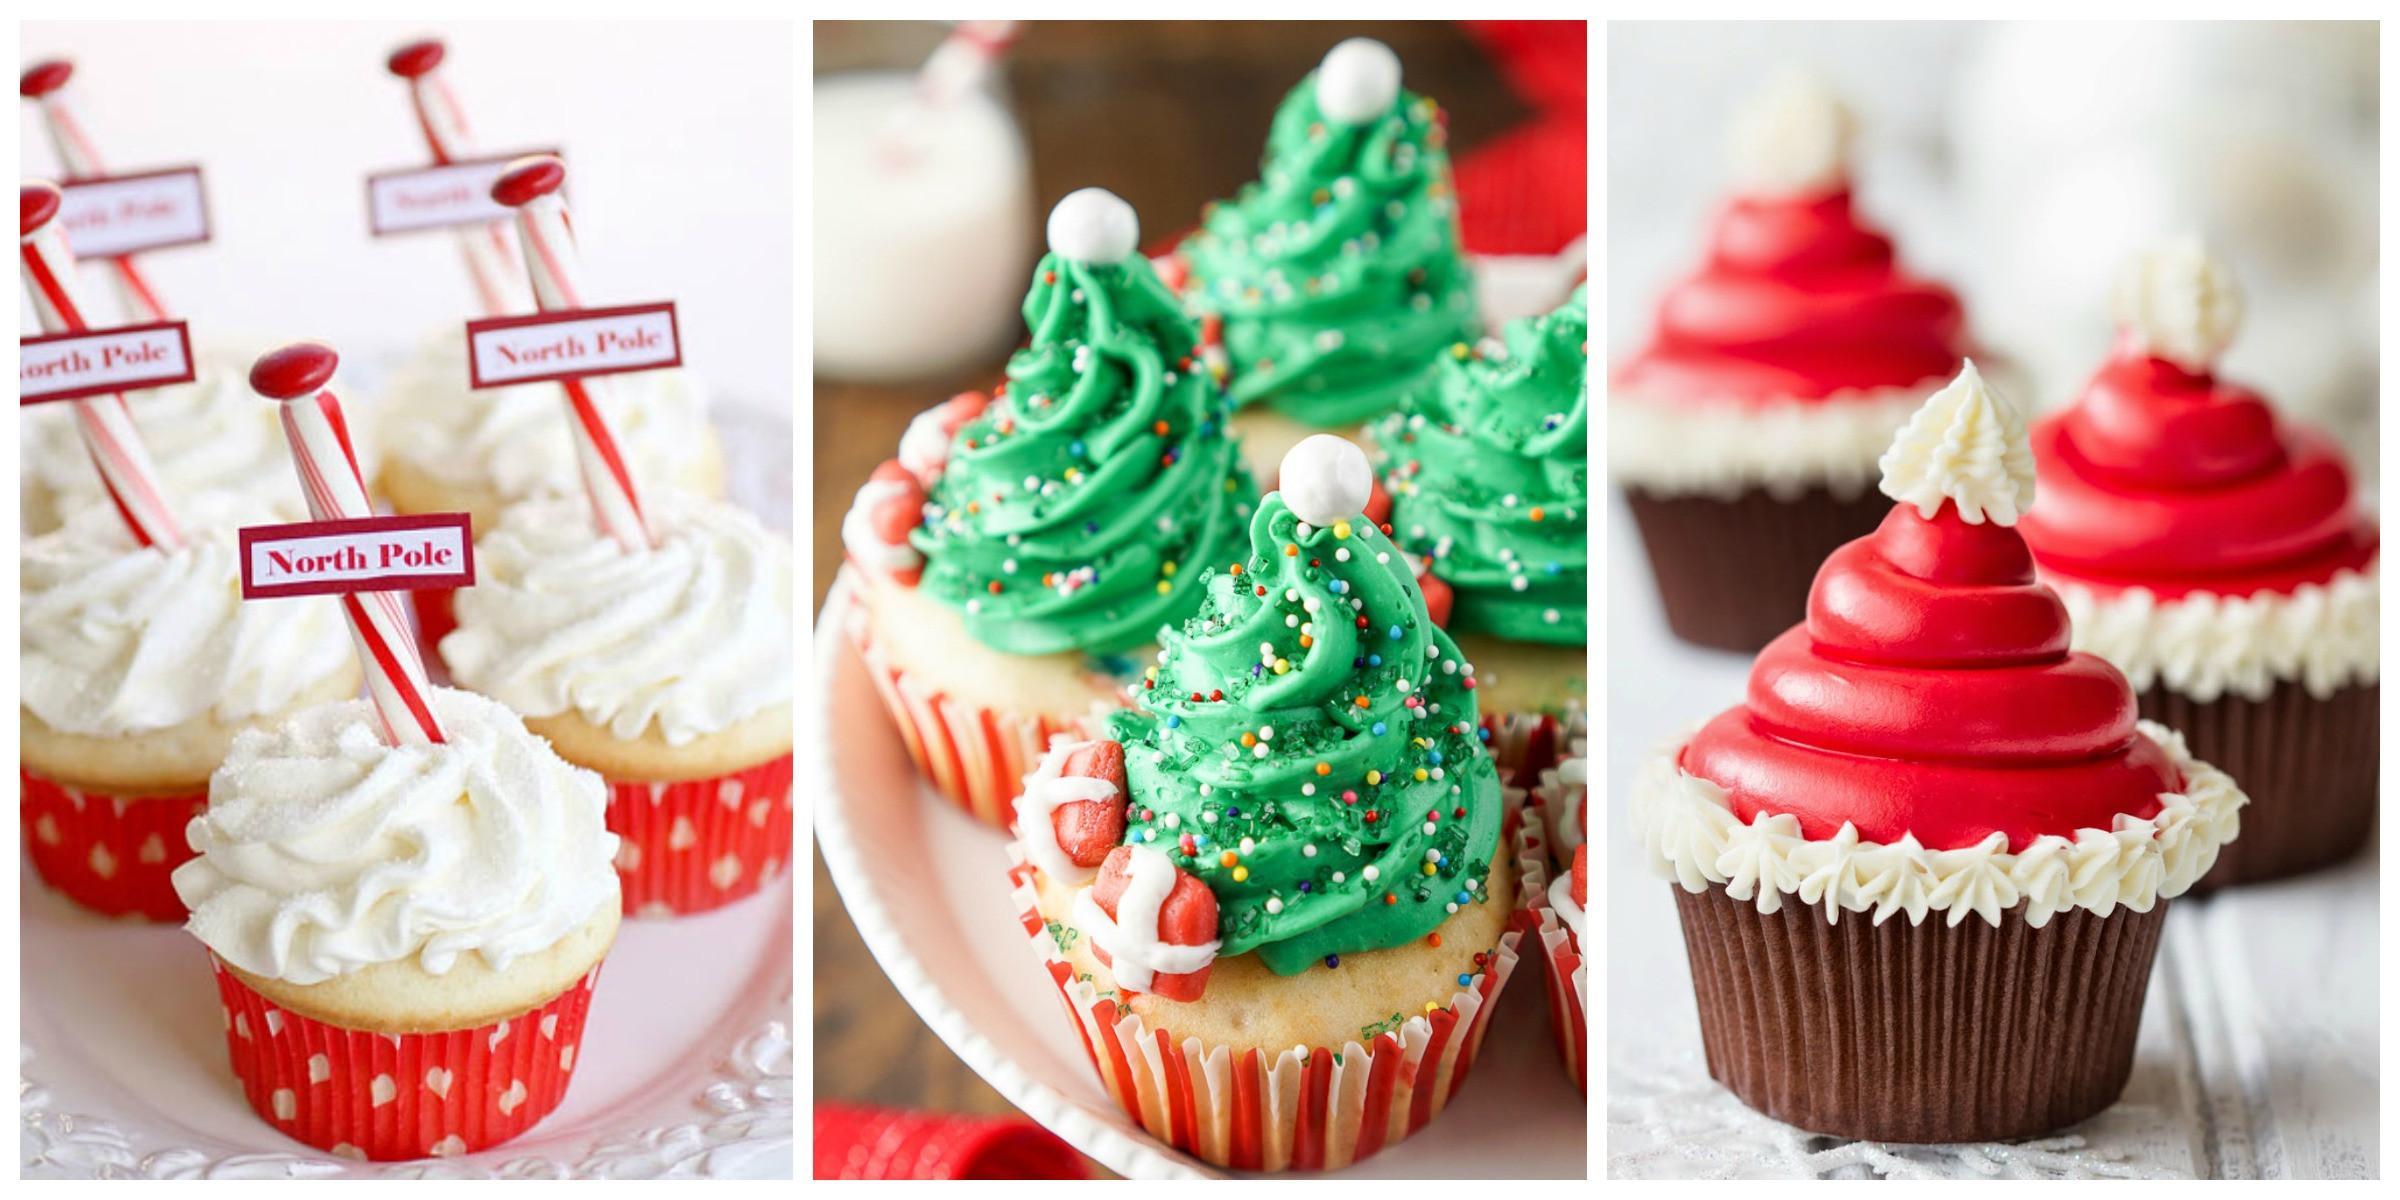 Christmas Cupcakes Ideas  19 Christmas Cupcakes Cupcake Decorating Ideas